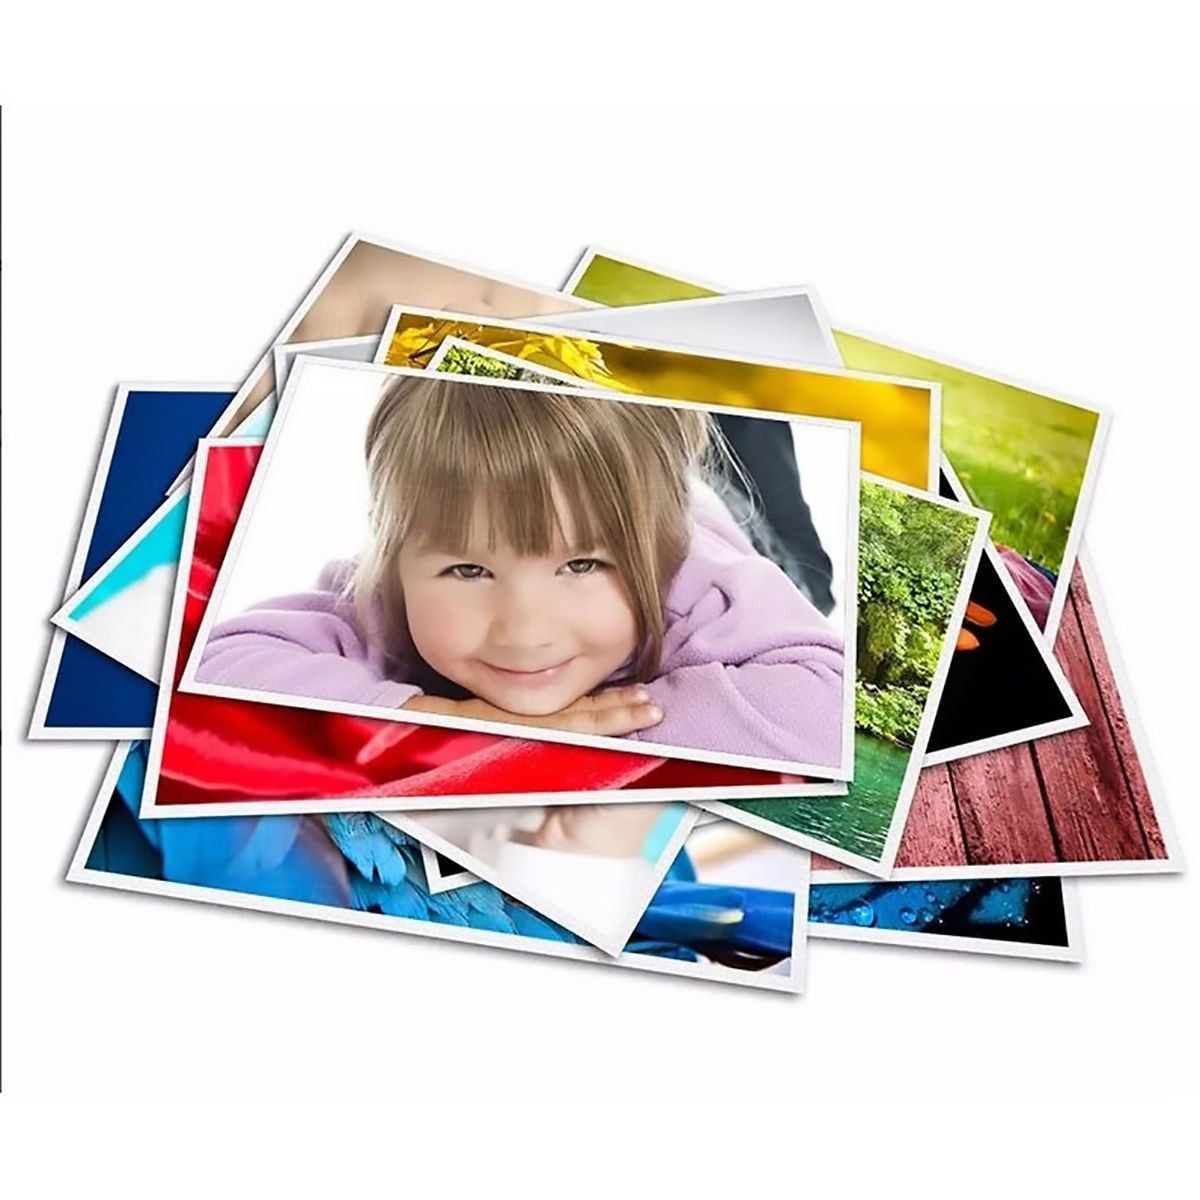 Papel Fotográfico Matte Fosco 108g A4 Branco Resistente à Água / 400 folhas